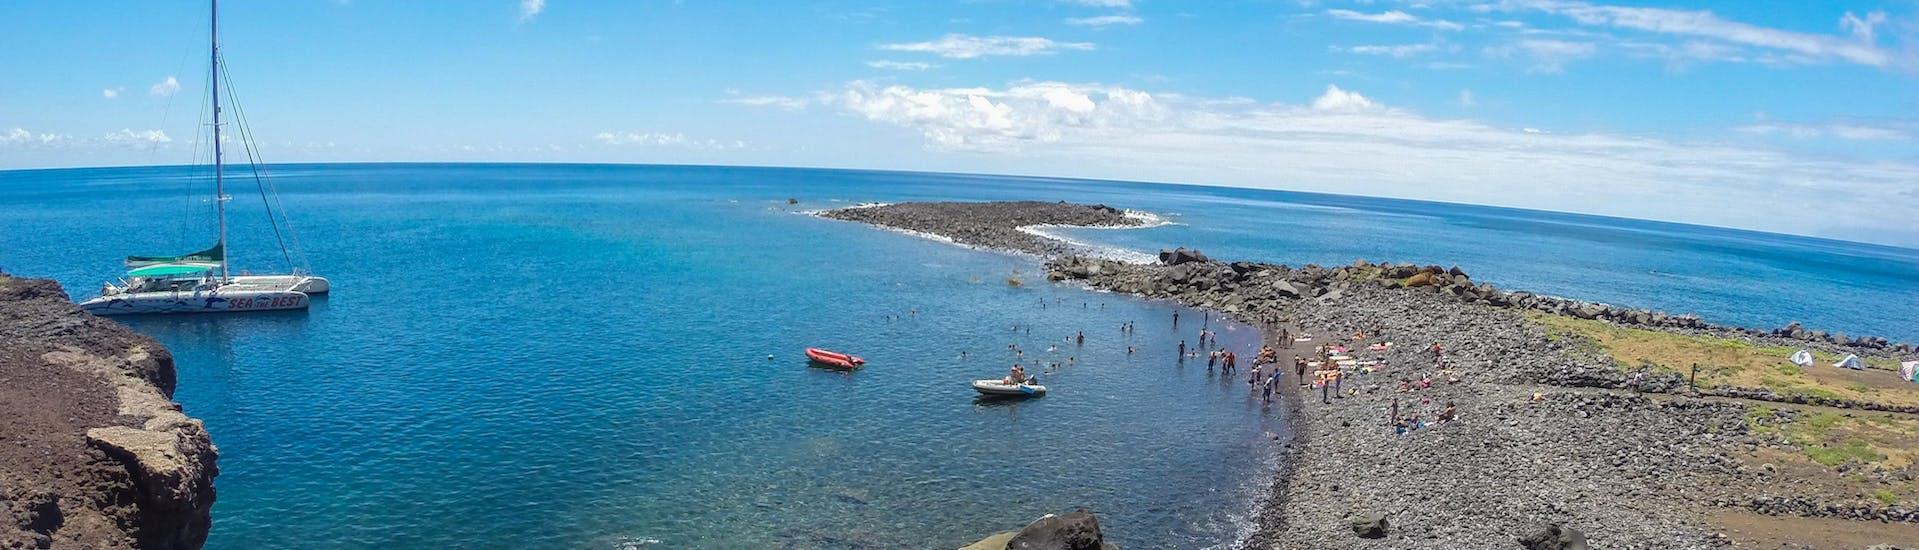 Catamaran Tour to Desertas Islands